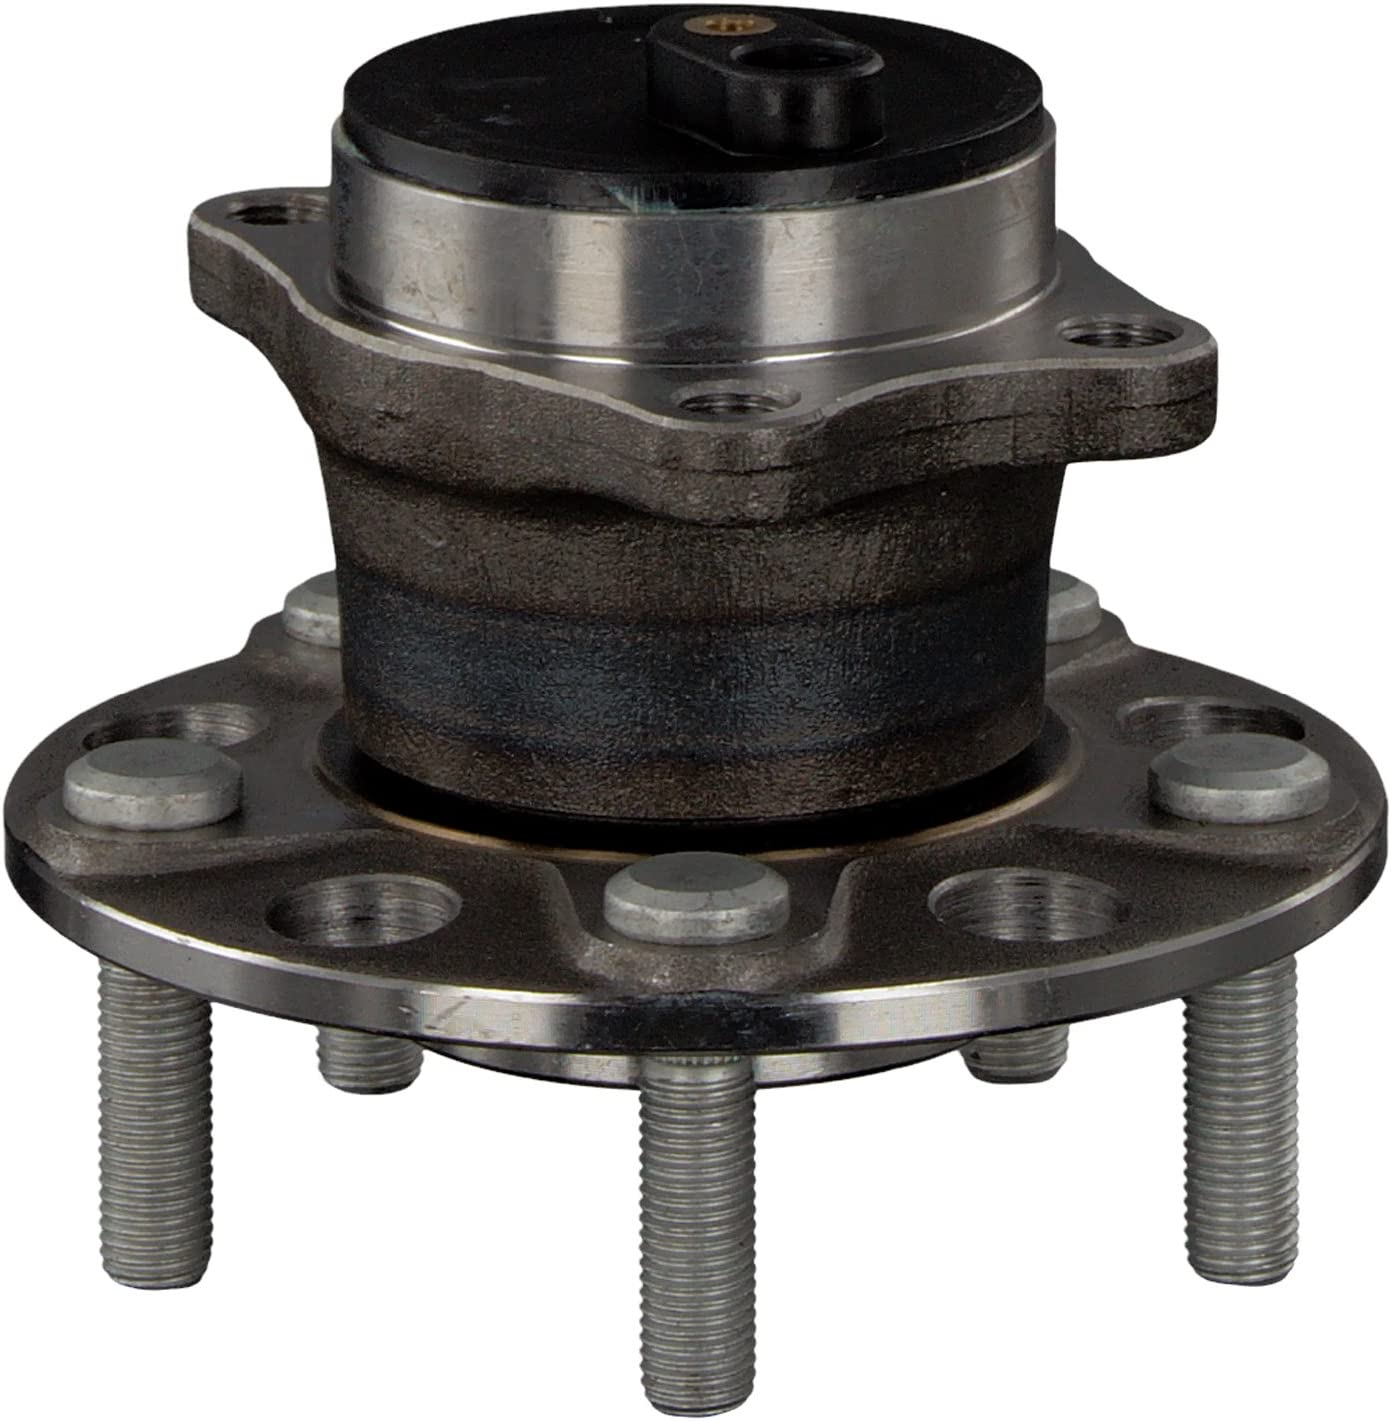 Blue Print ADA108304 Wheel Bearing Kit with wheel hub and ABS sensor ring pack of one